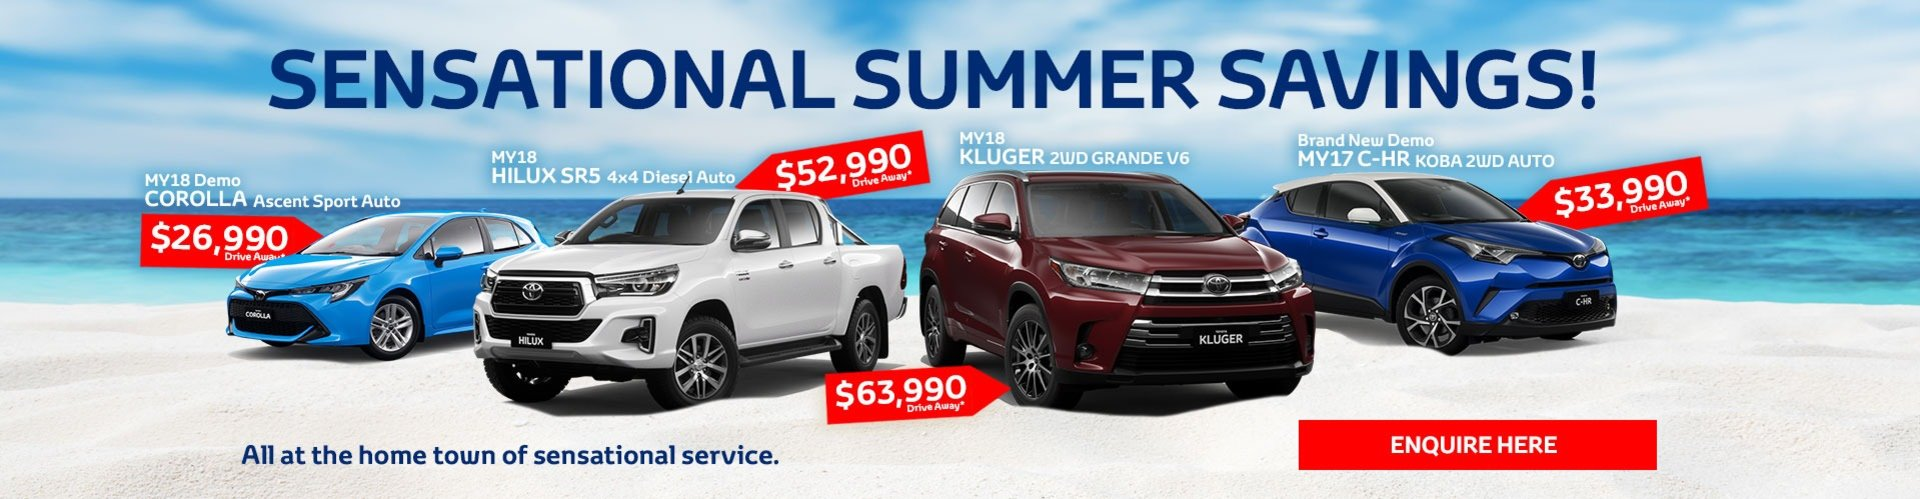 Sensational Summer Savings